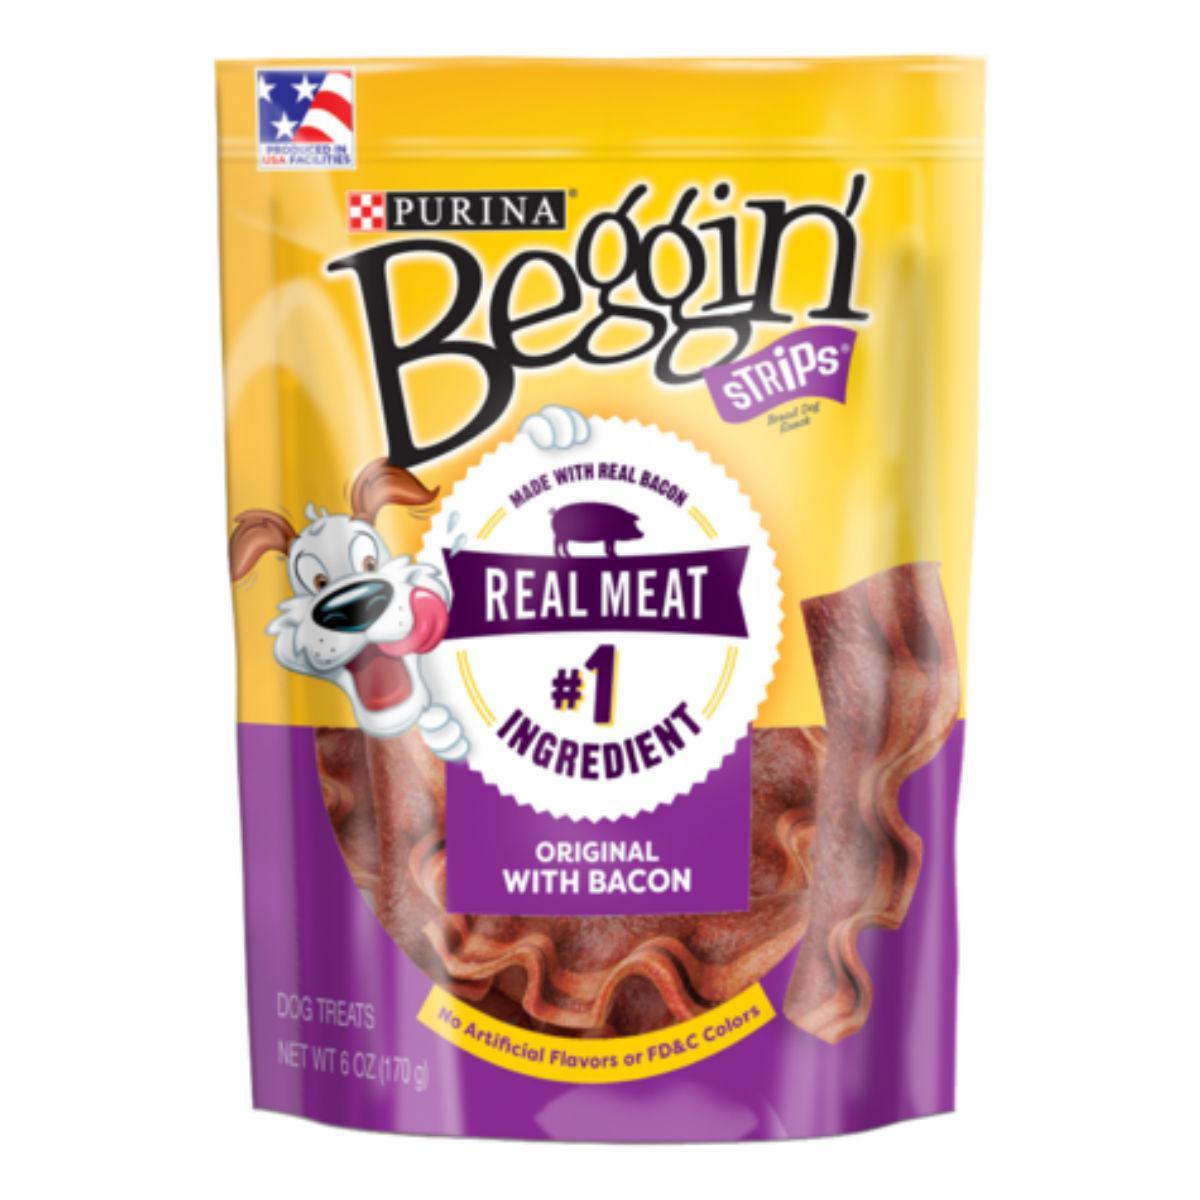 Purina Beggin Strips Dog Treats - Bacon Flavor